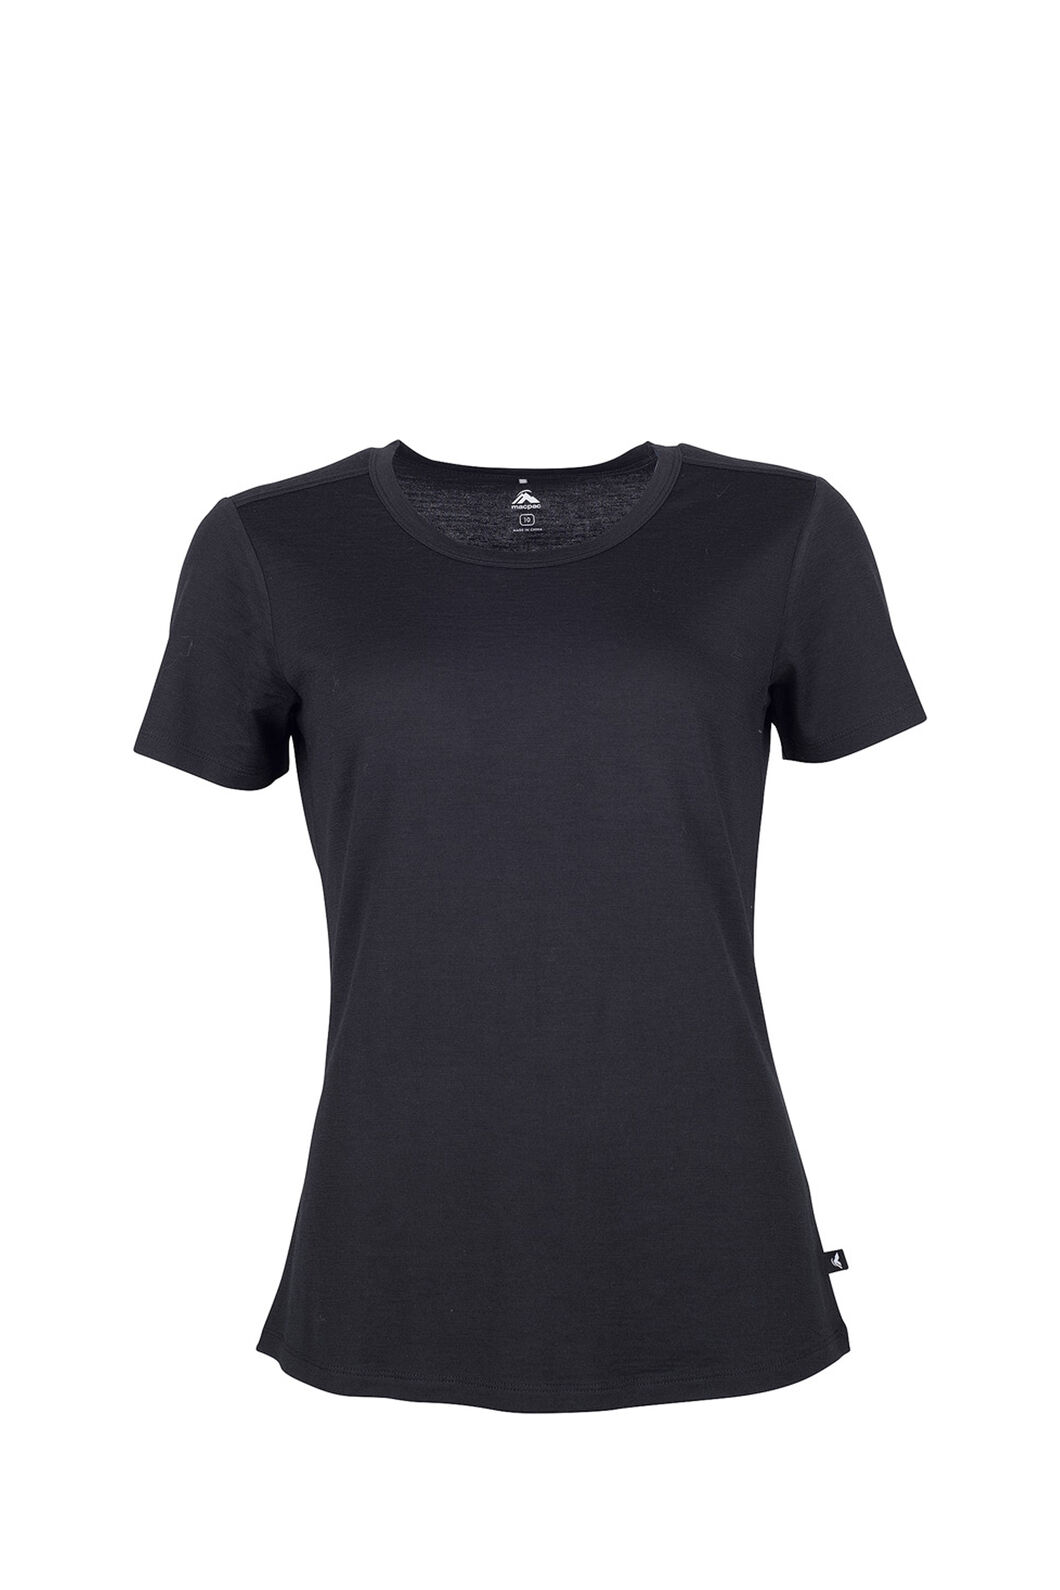 Macpac Lyellette 180 Merino Tee — Women's, Black, hi-res